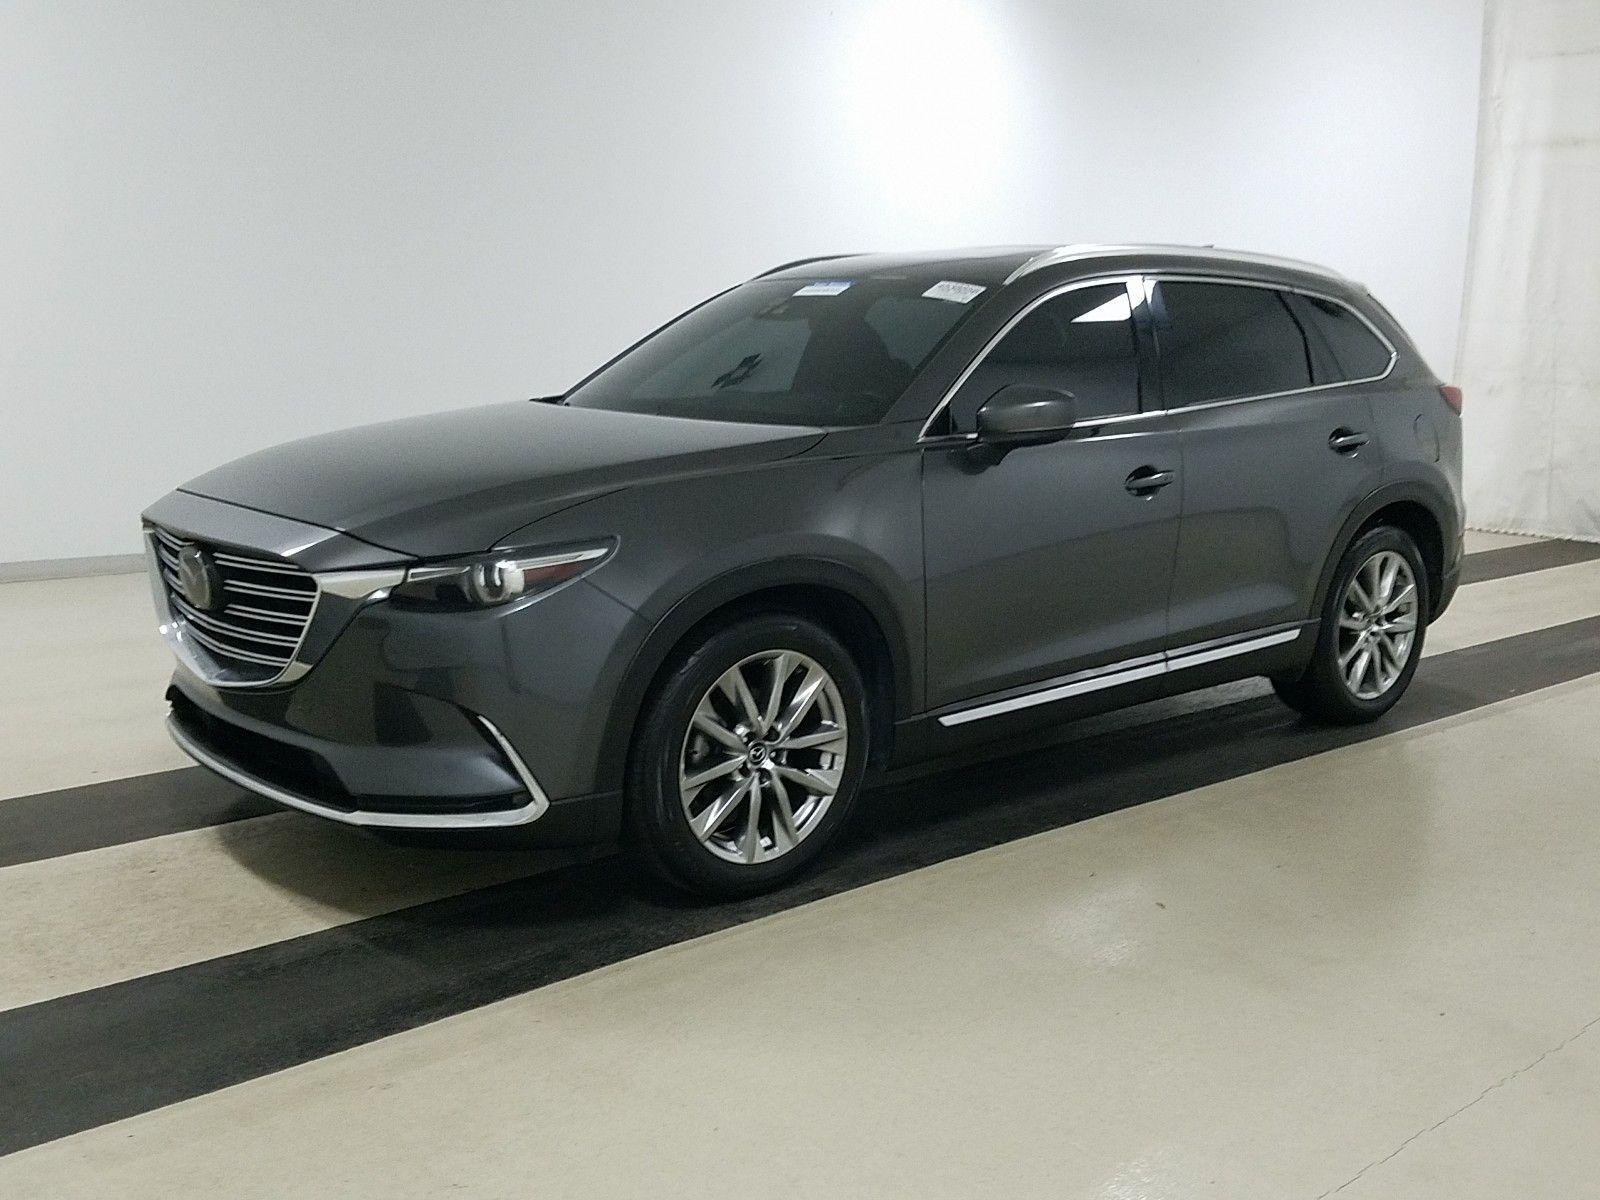 2017 Mazda Cx-9 2.5. Lot 99915984346 Vin JM3TCADYXH0140957